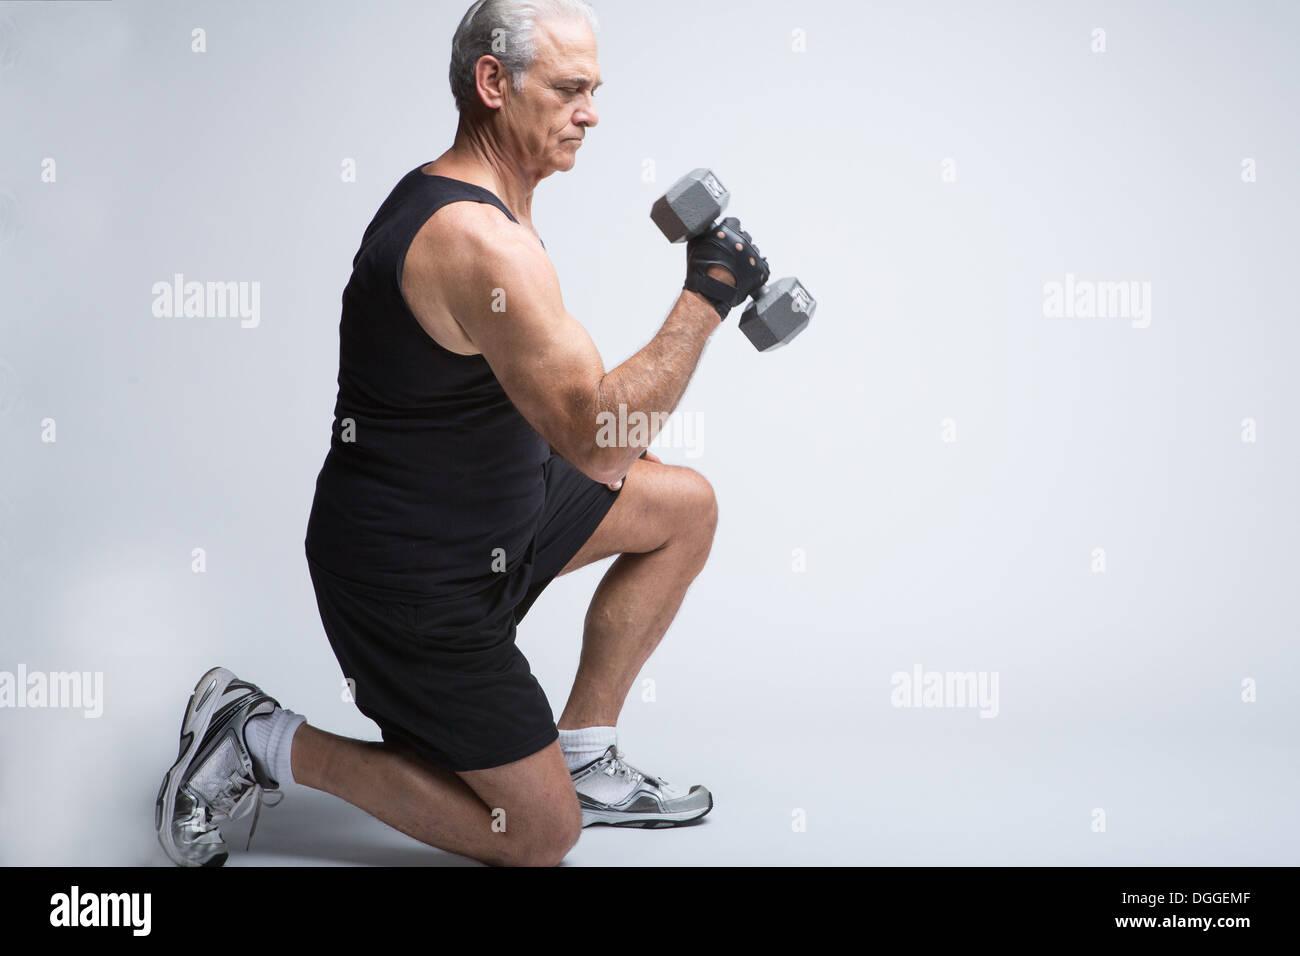 Senior man in sports clothing lifting broccoli - Stock Image